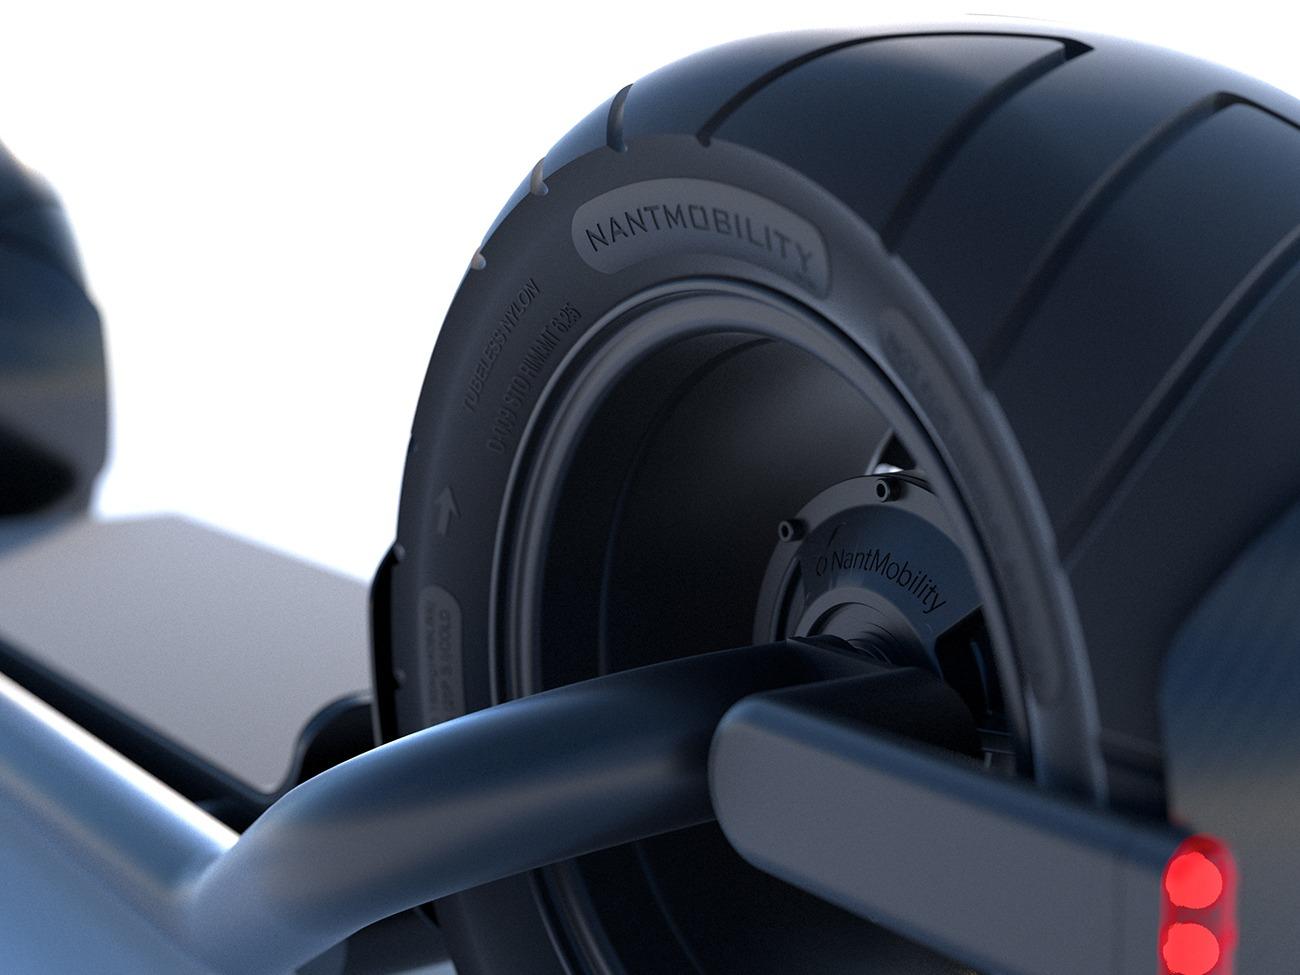 Stator nantmobility-motor